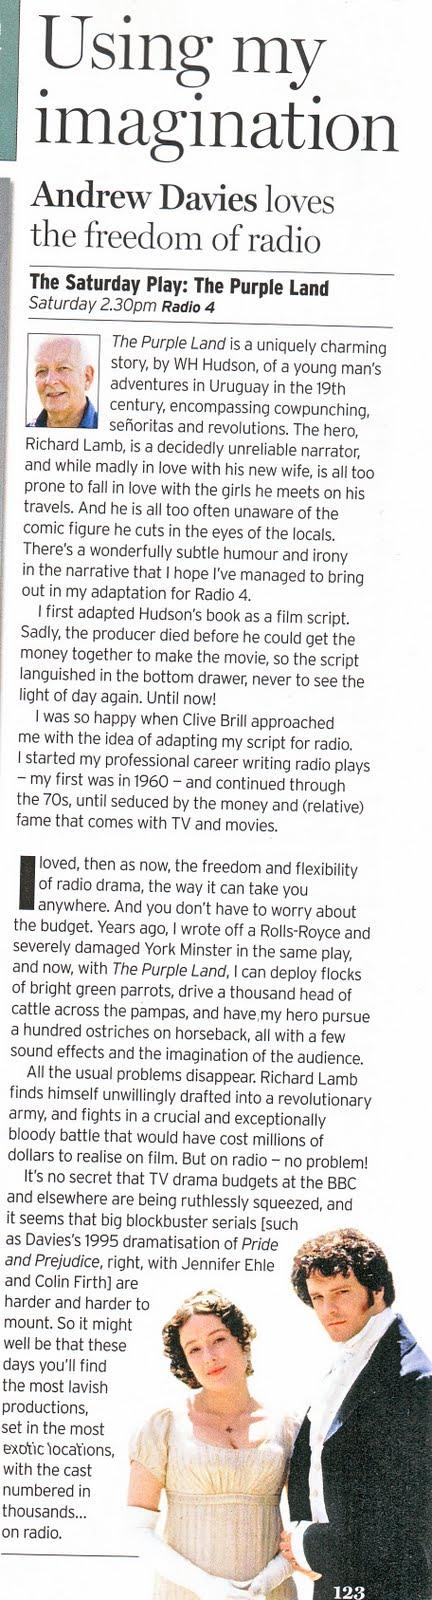 David Tennant The Original Fansite News